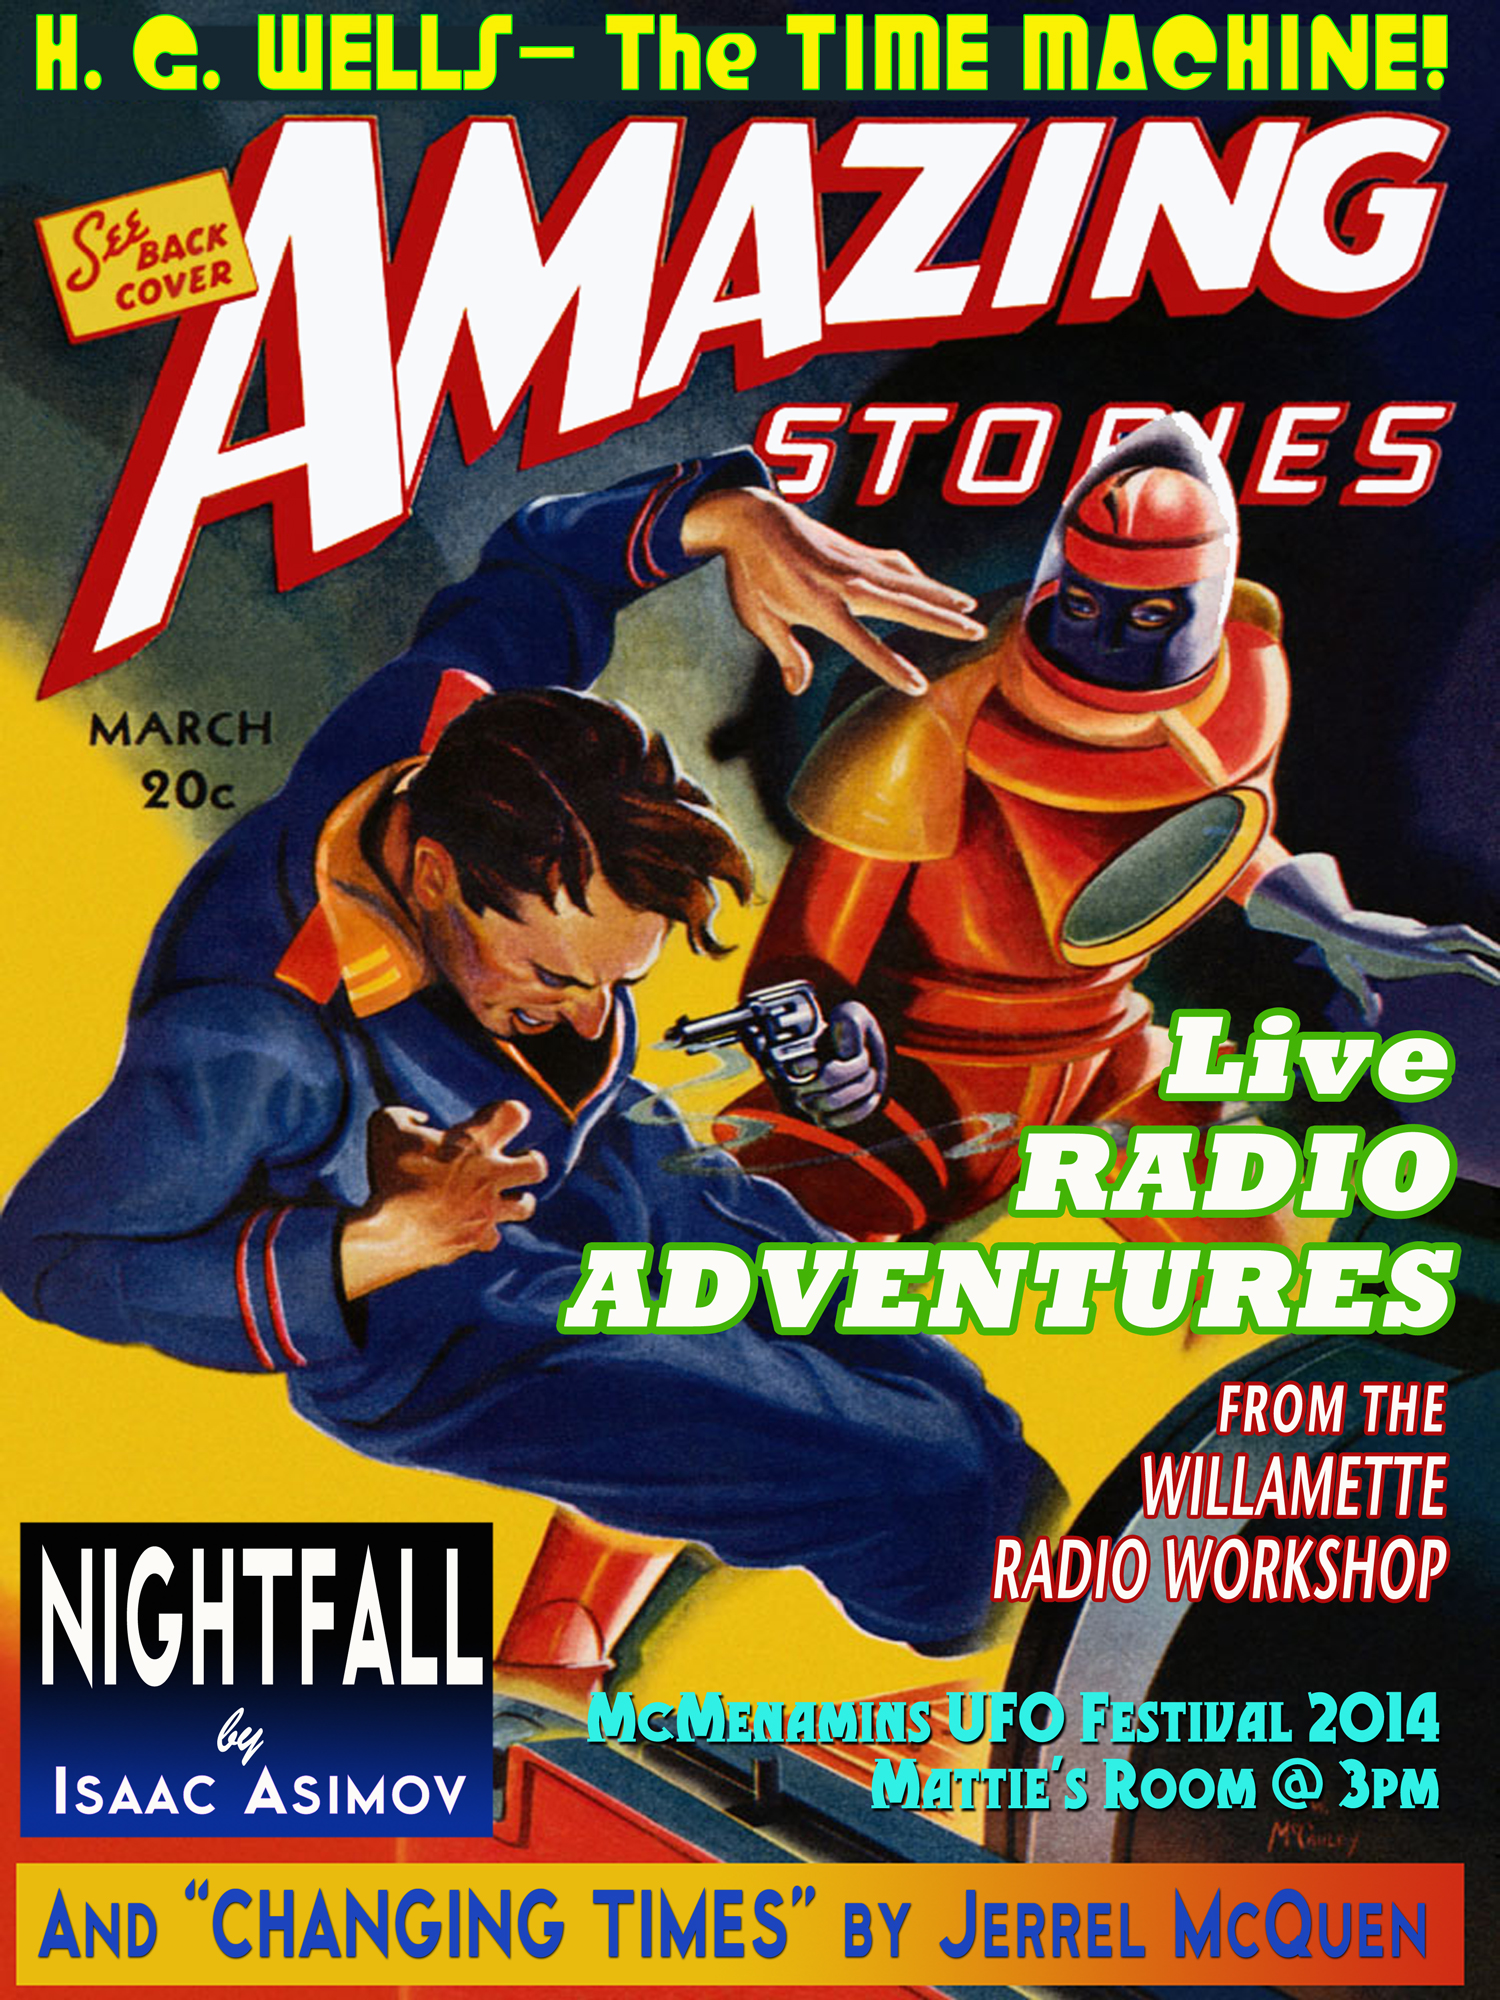 Live Radio Adventures, UFO Festival 2014